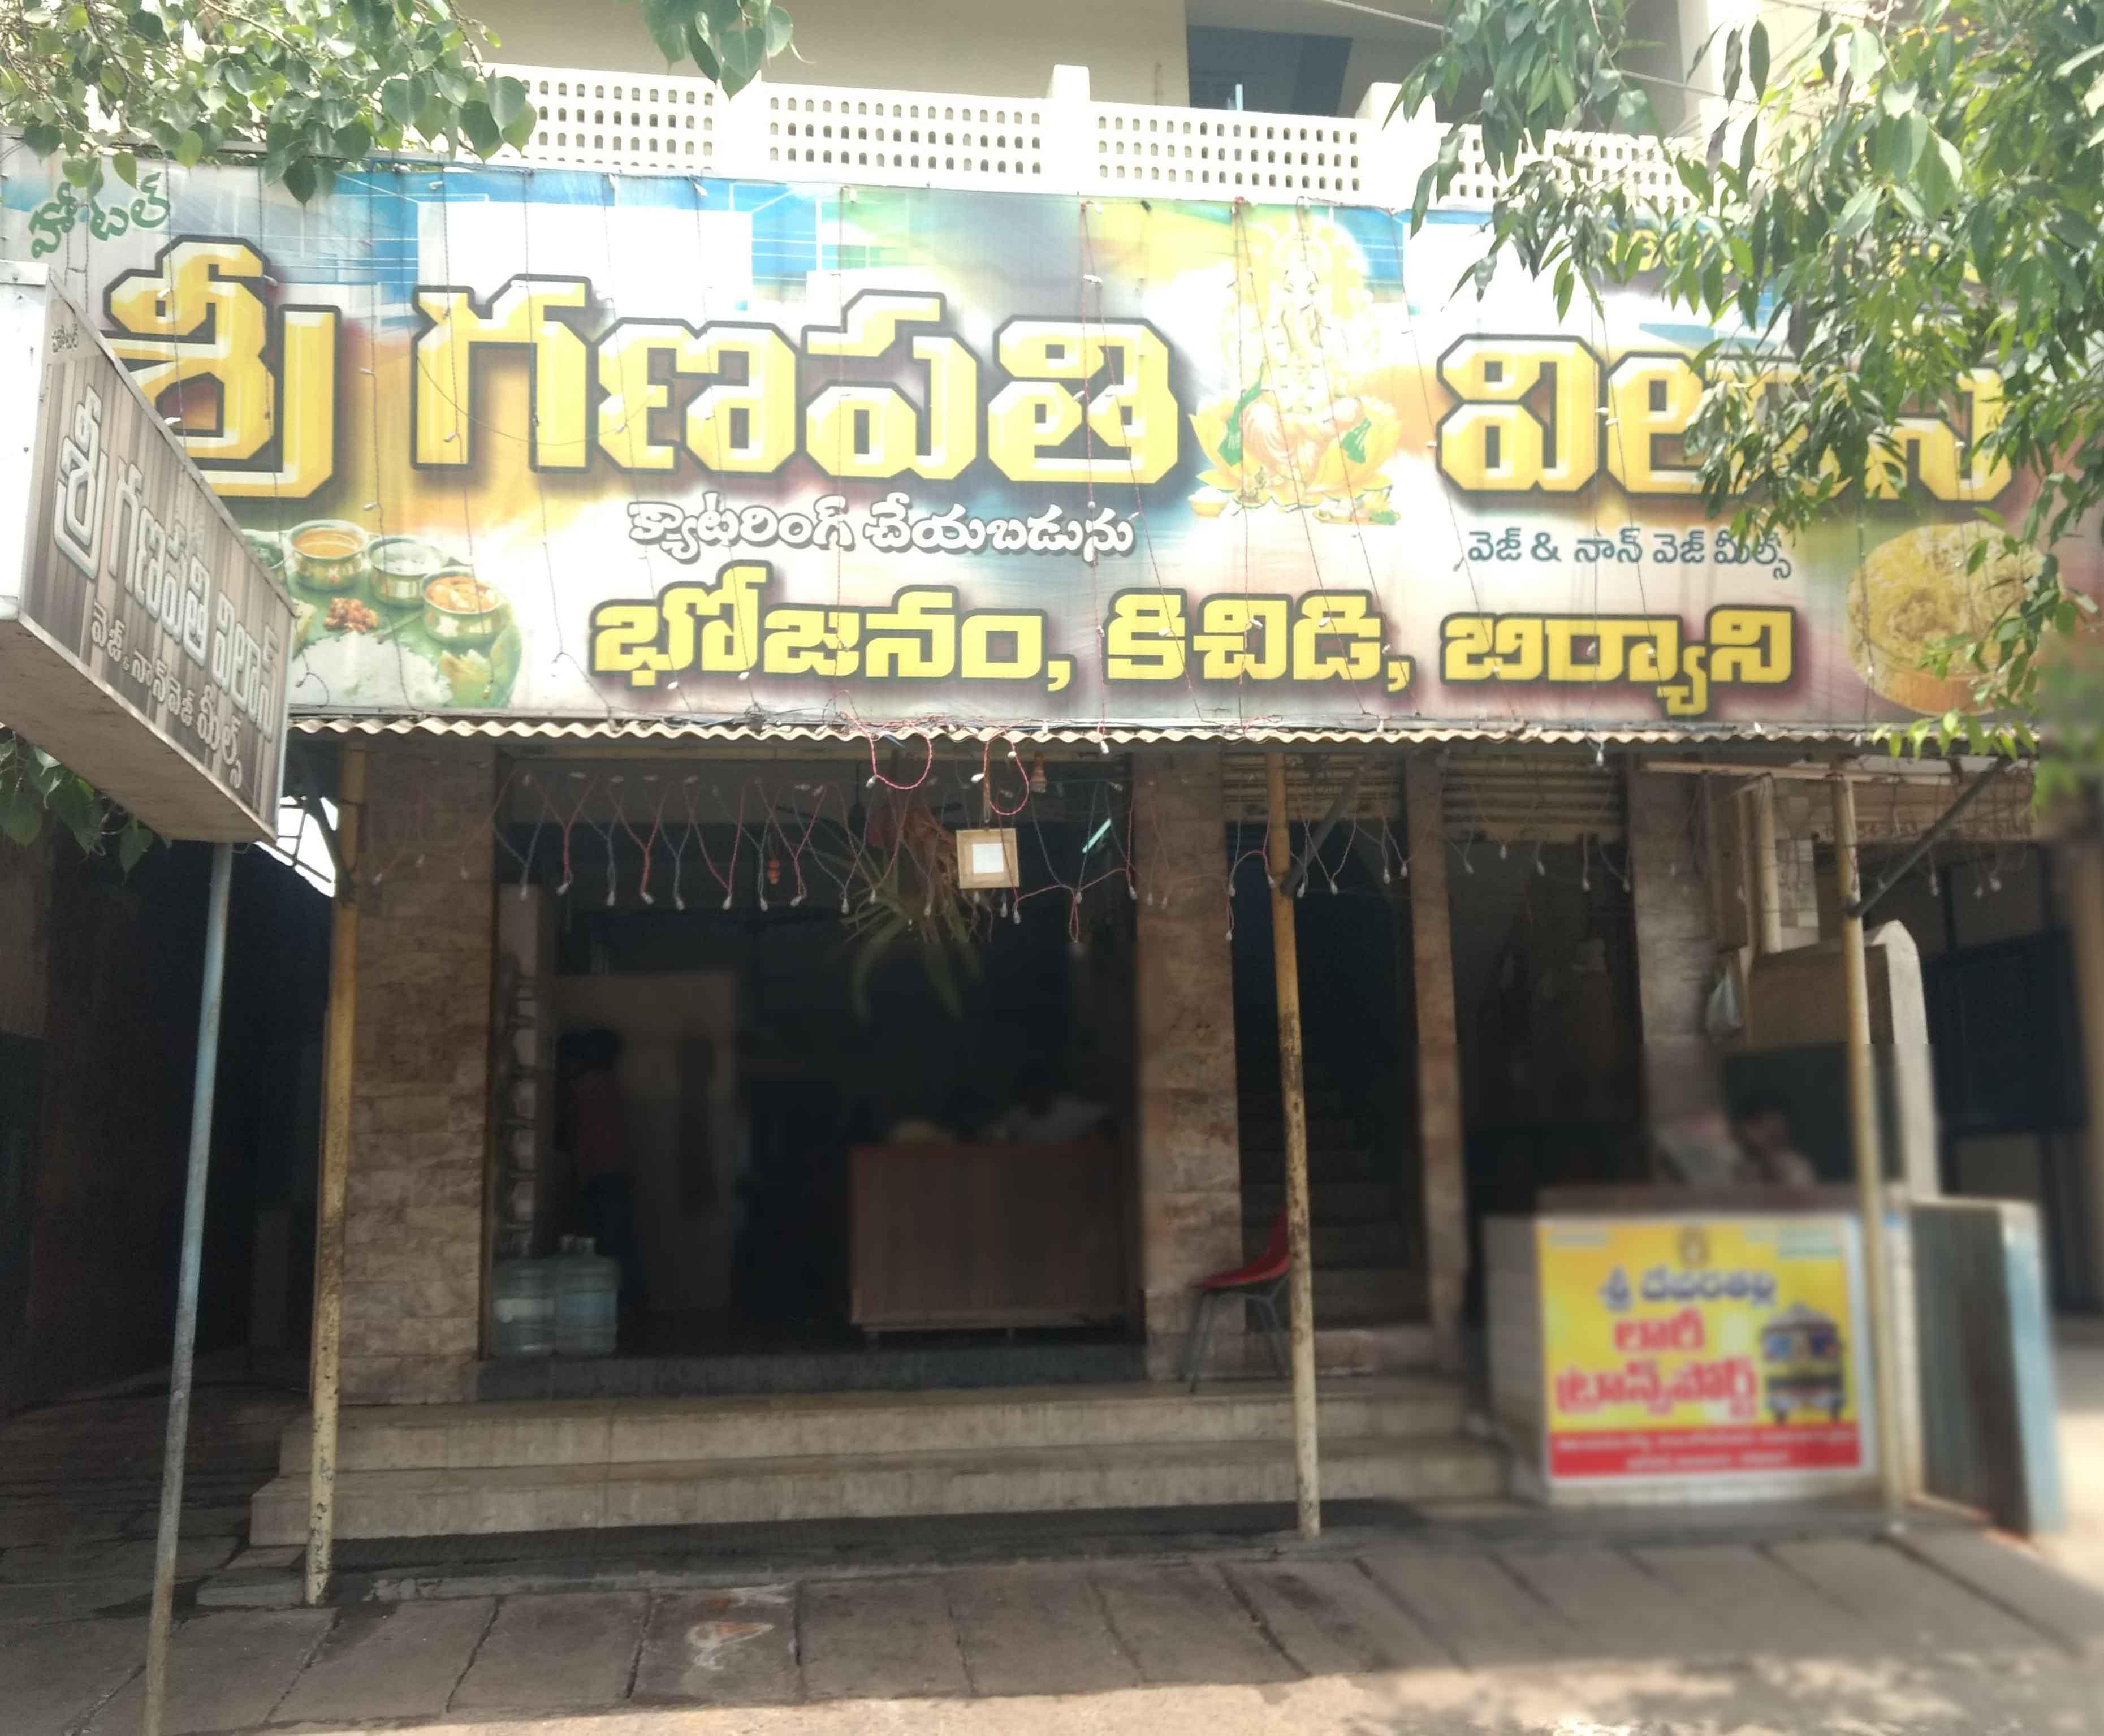 Sri Ganapathi Vilas - Auto Nagar - Vijayawada Image